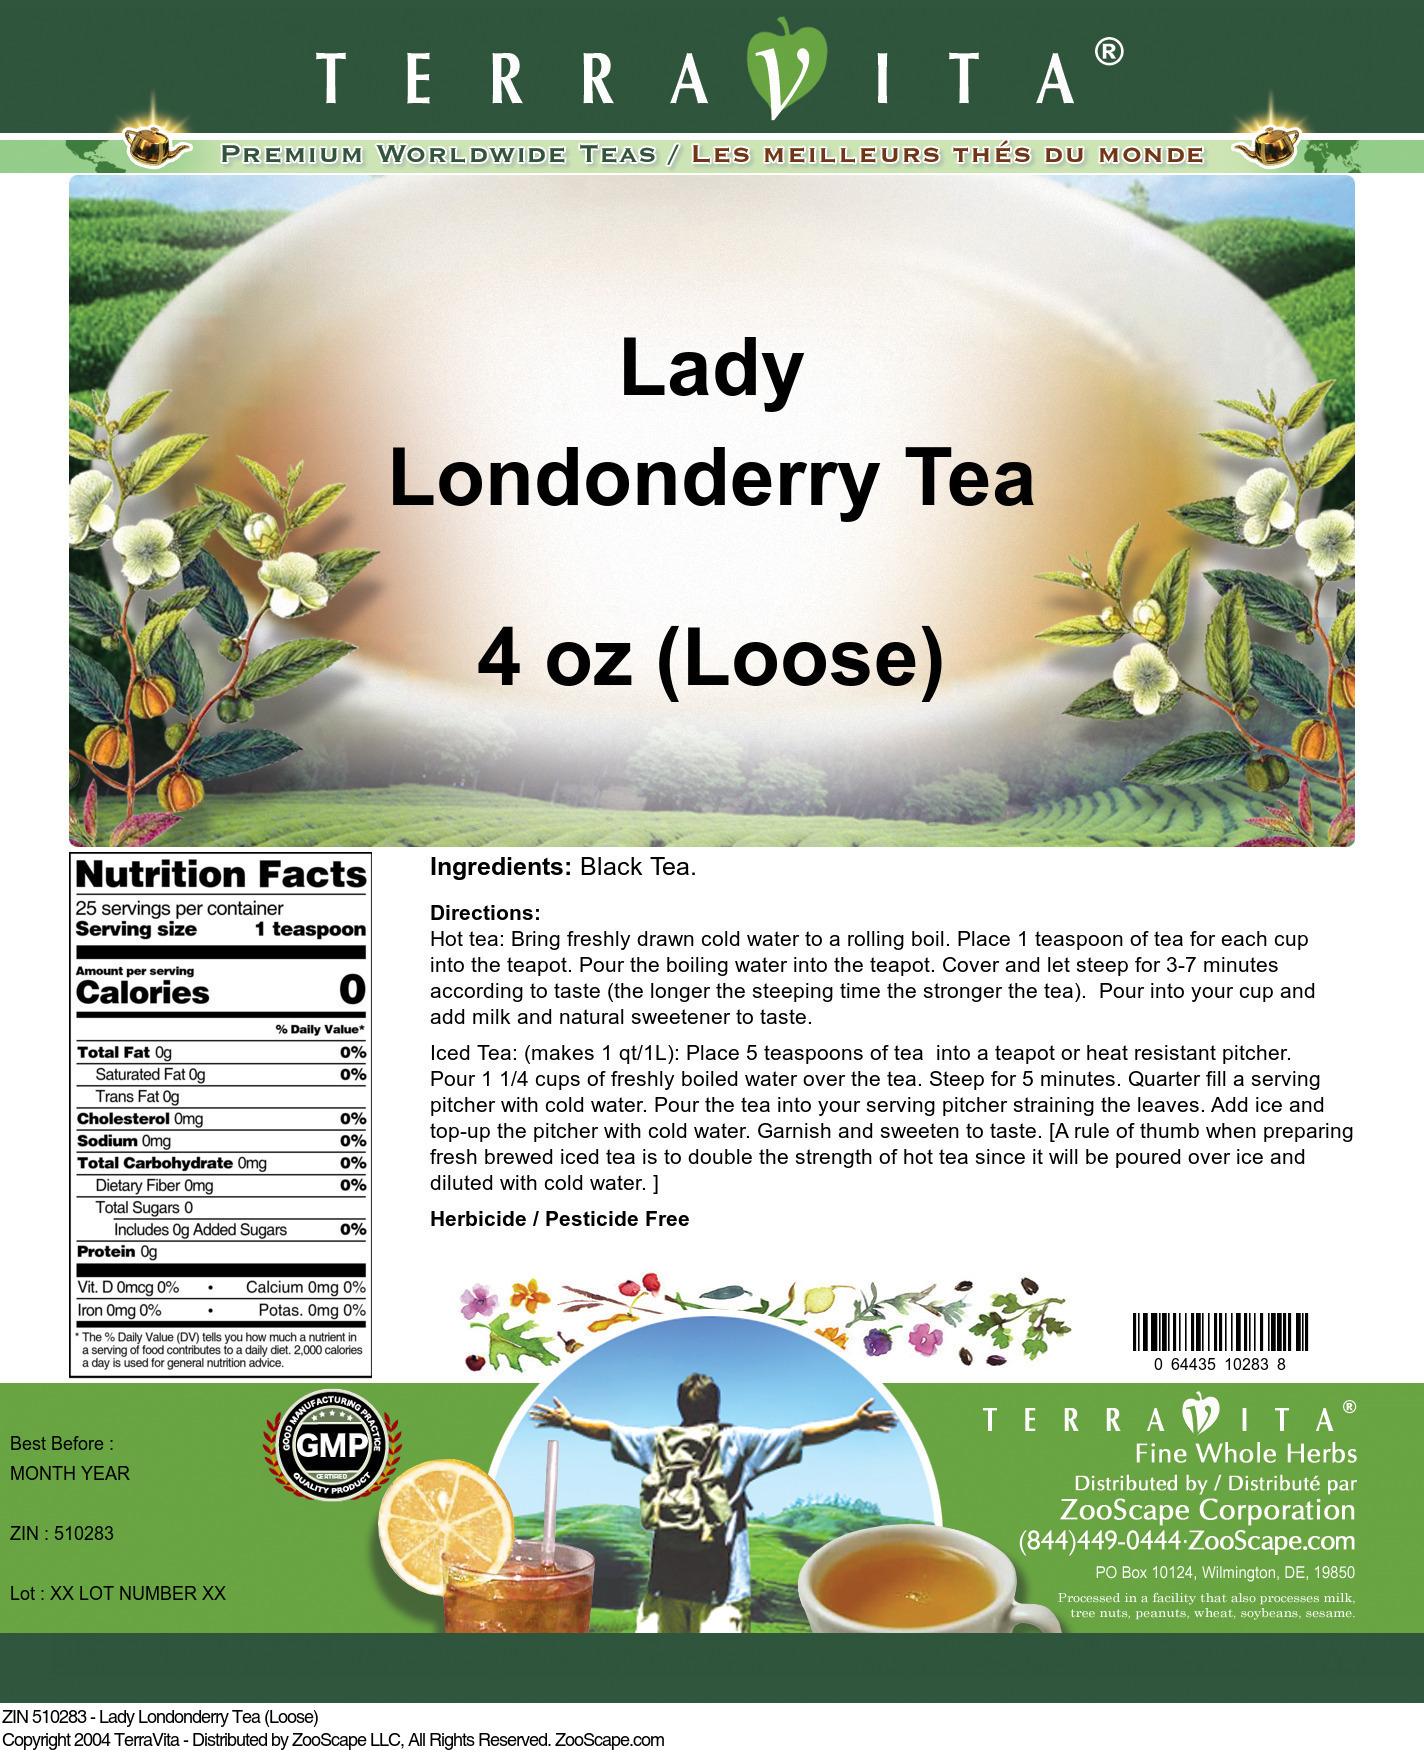 Lady Londonderry Tea (Loose)